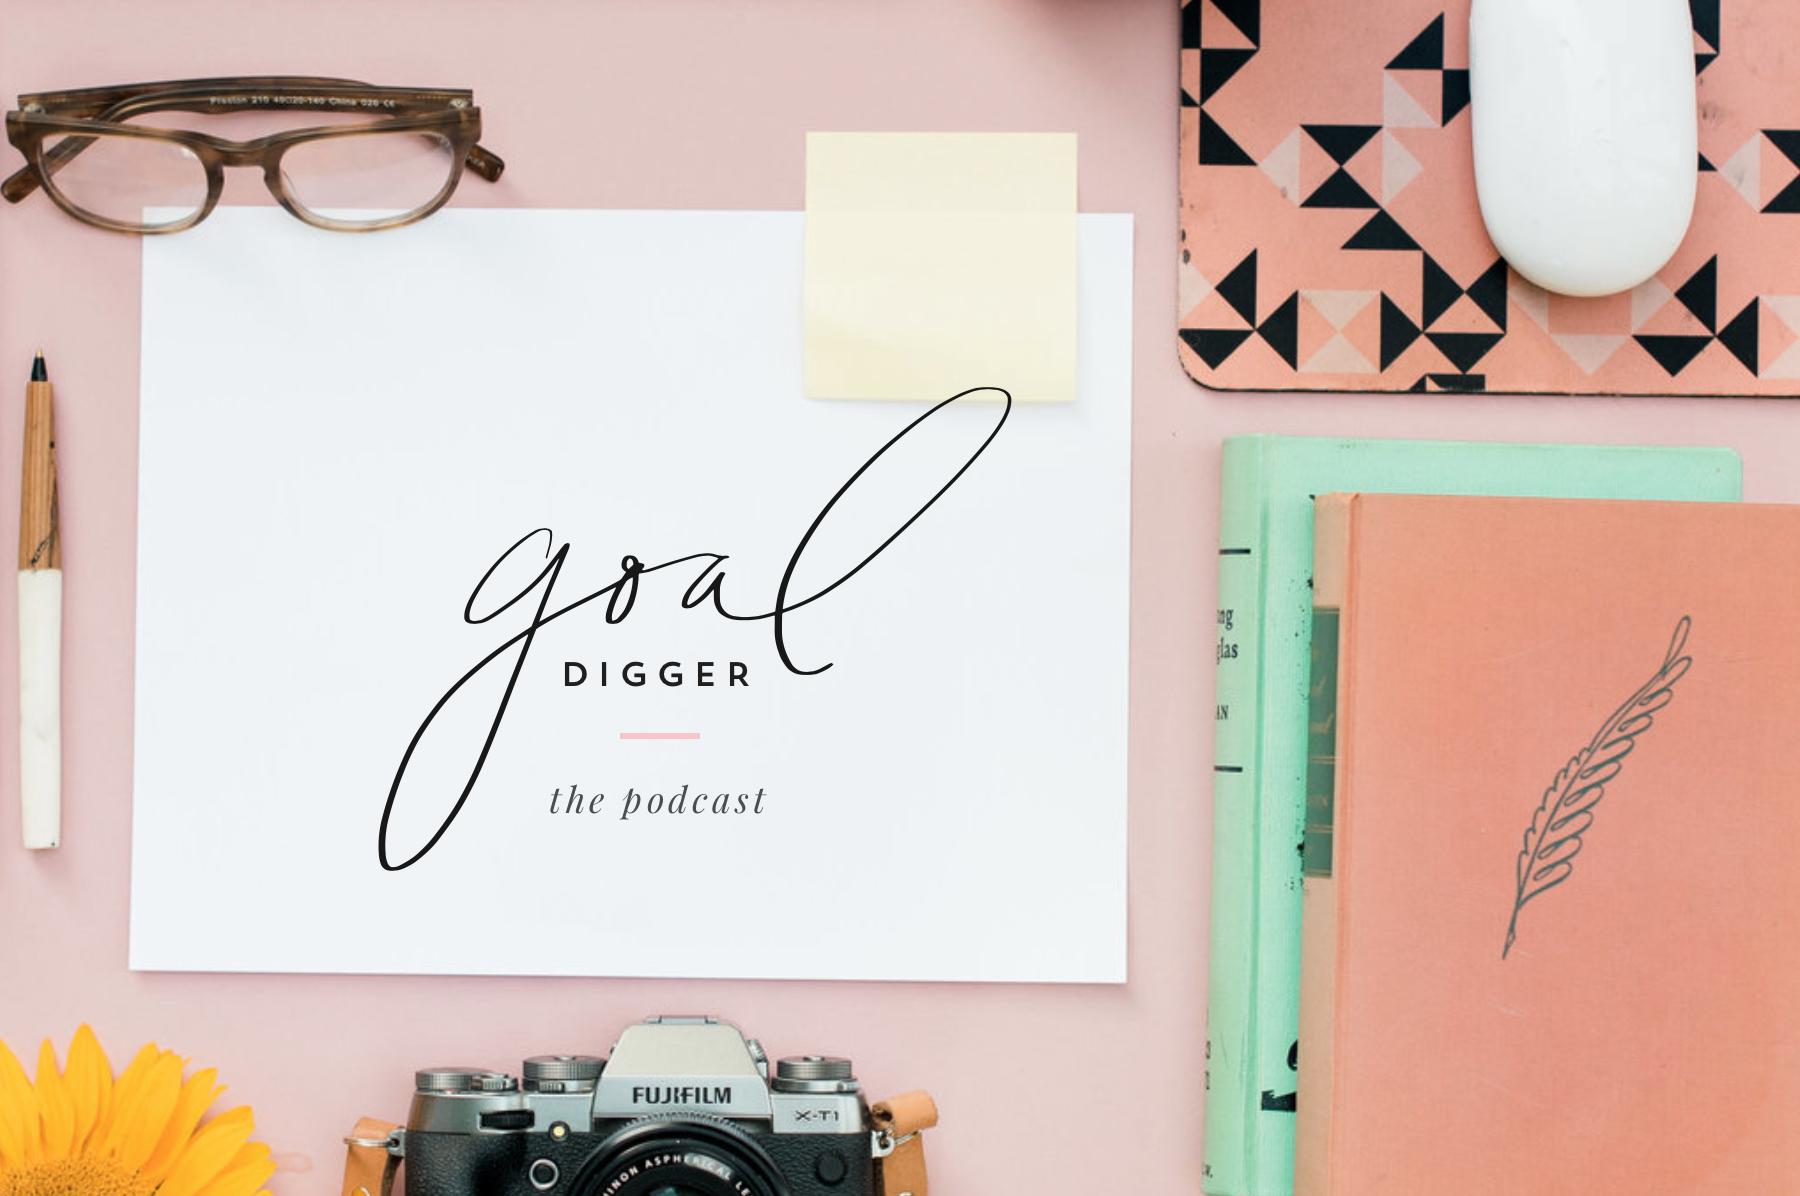 The Goal Digger Podcast via  Jenna Kutcher